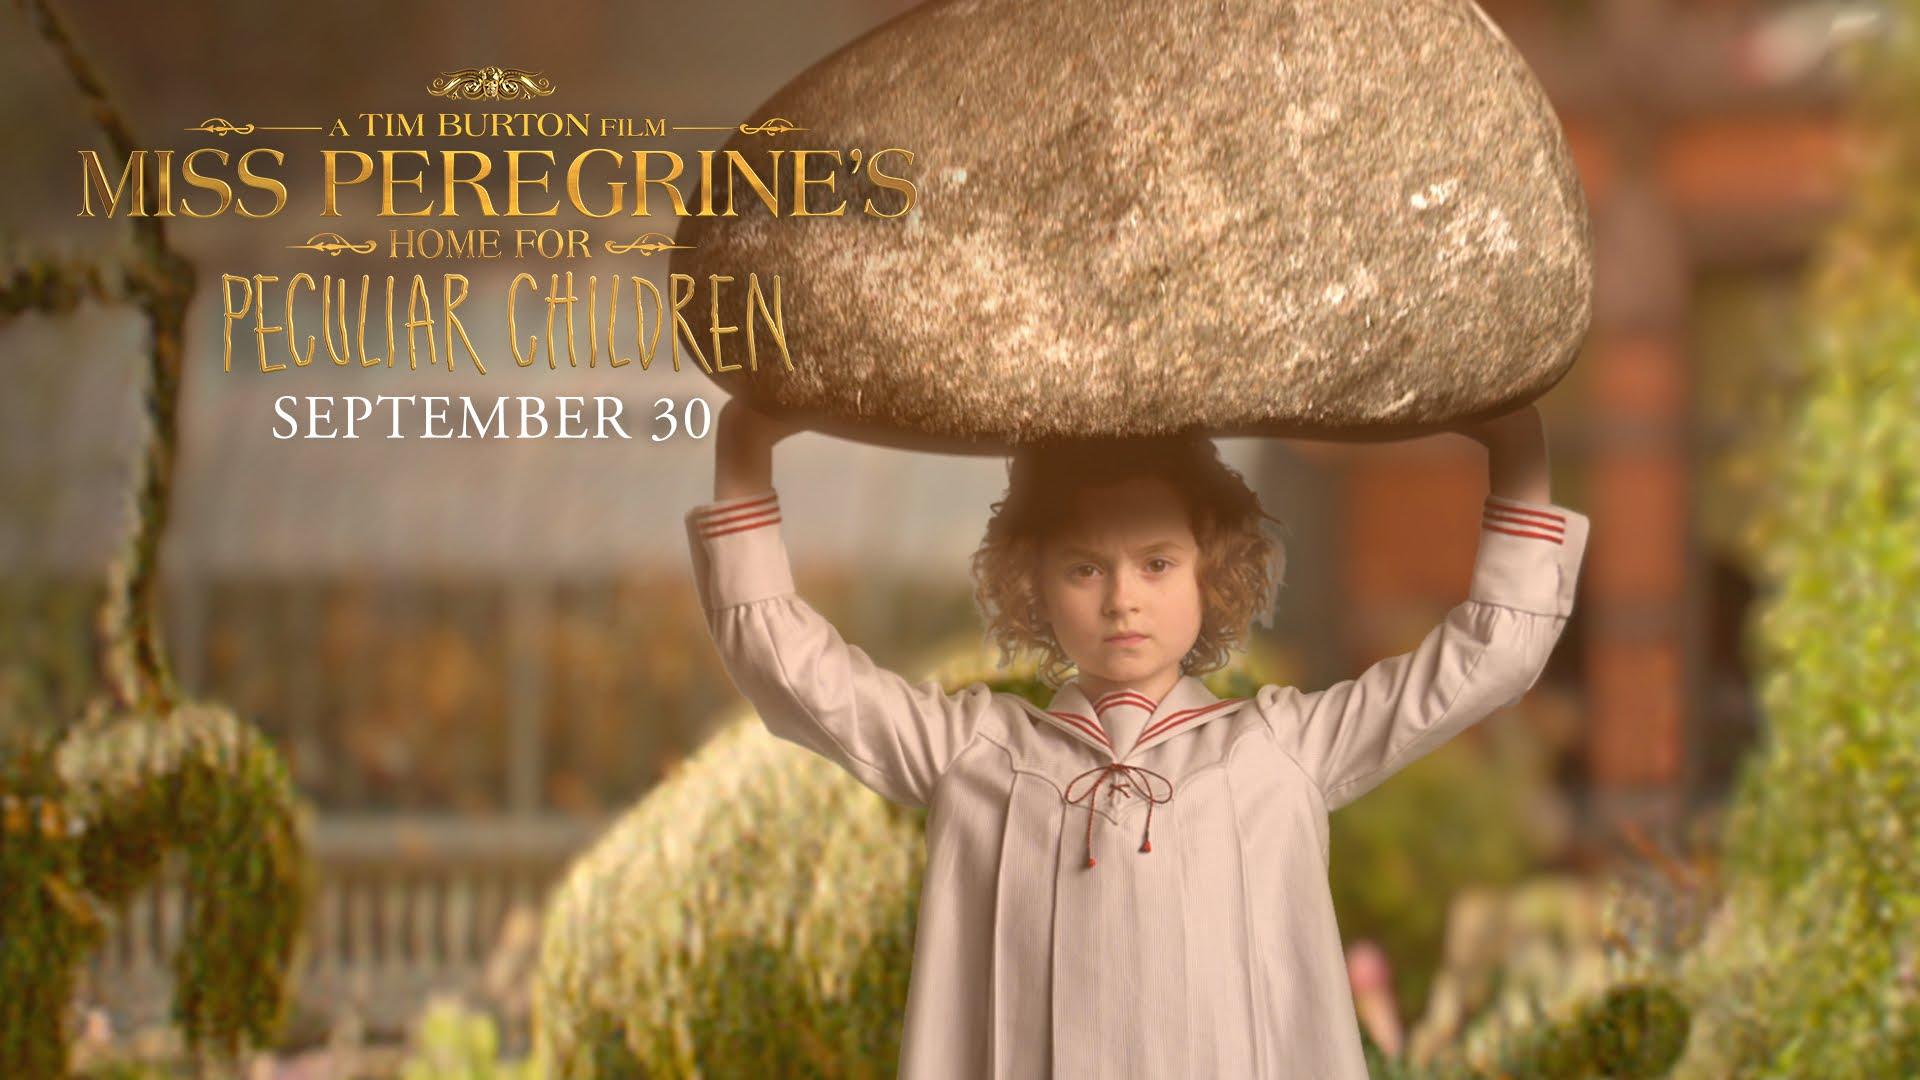 Miss Peregrine's Home for Peculiar Children | Trailer Announcement | 20th Century FOX